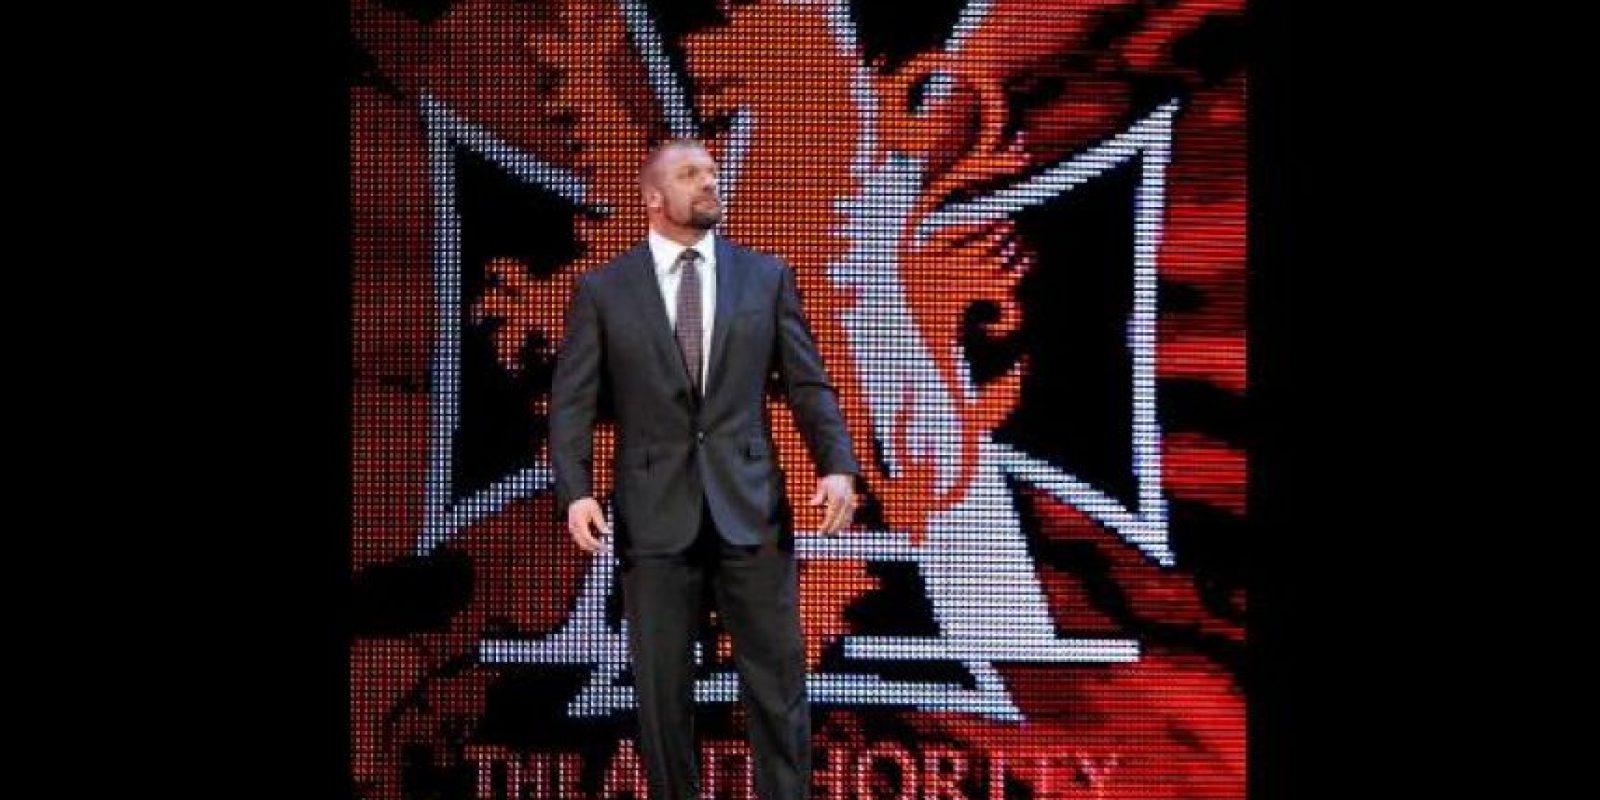 Como un extra, Sting tendrá un careo con Triple H Foto:WWE